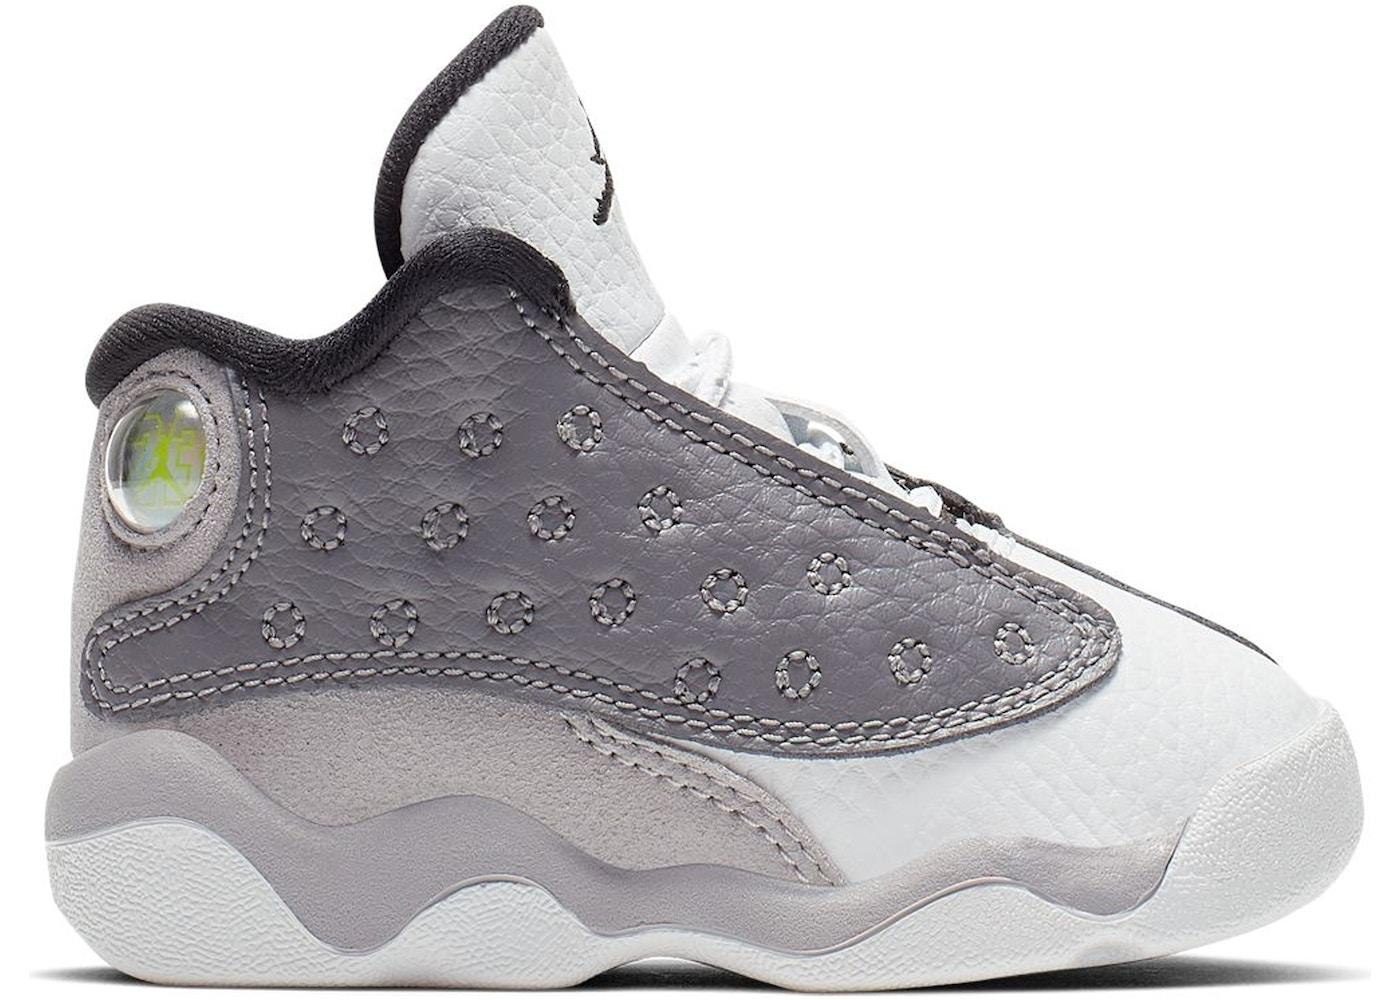 70cfbb4bbf5621 Jordan 13 Retro Atmosphere Grey (TD) - 414581-016